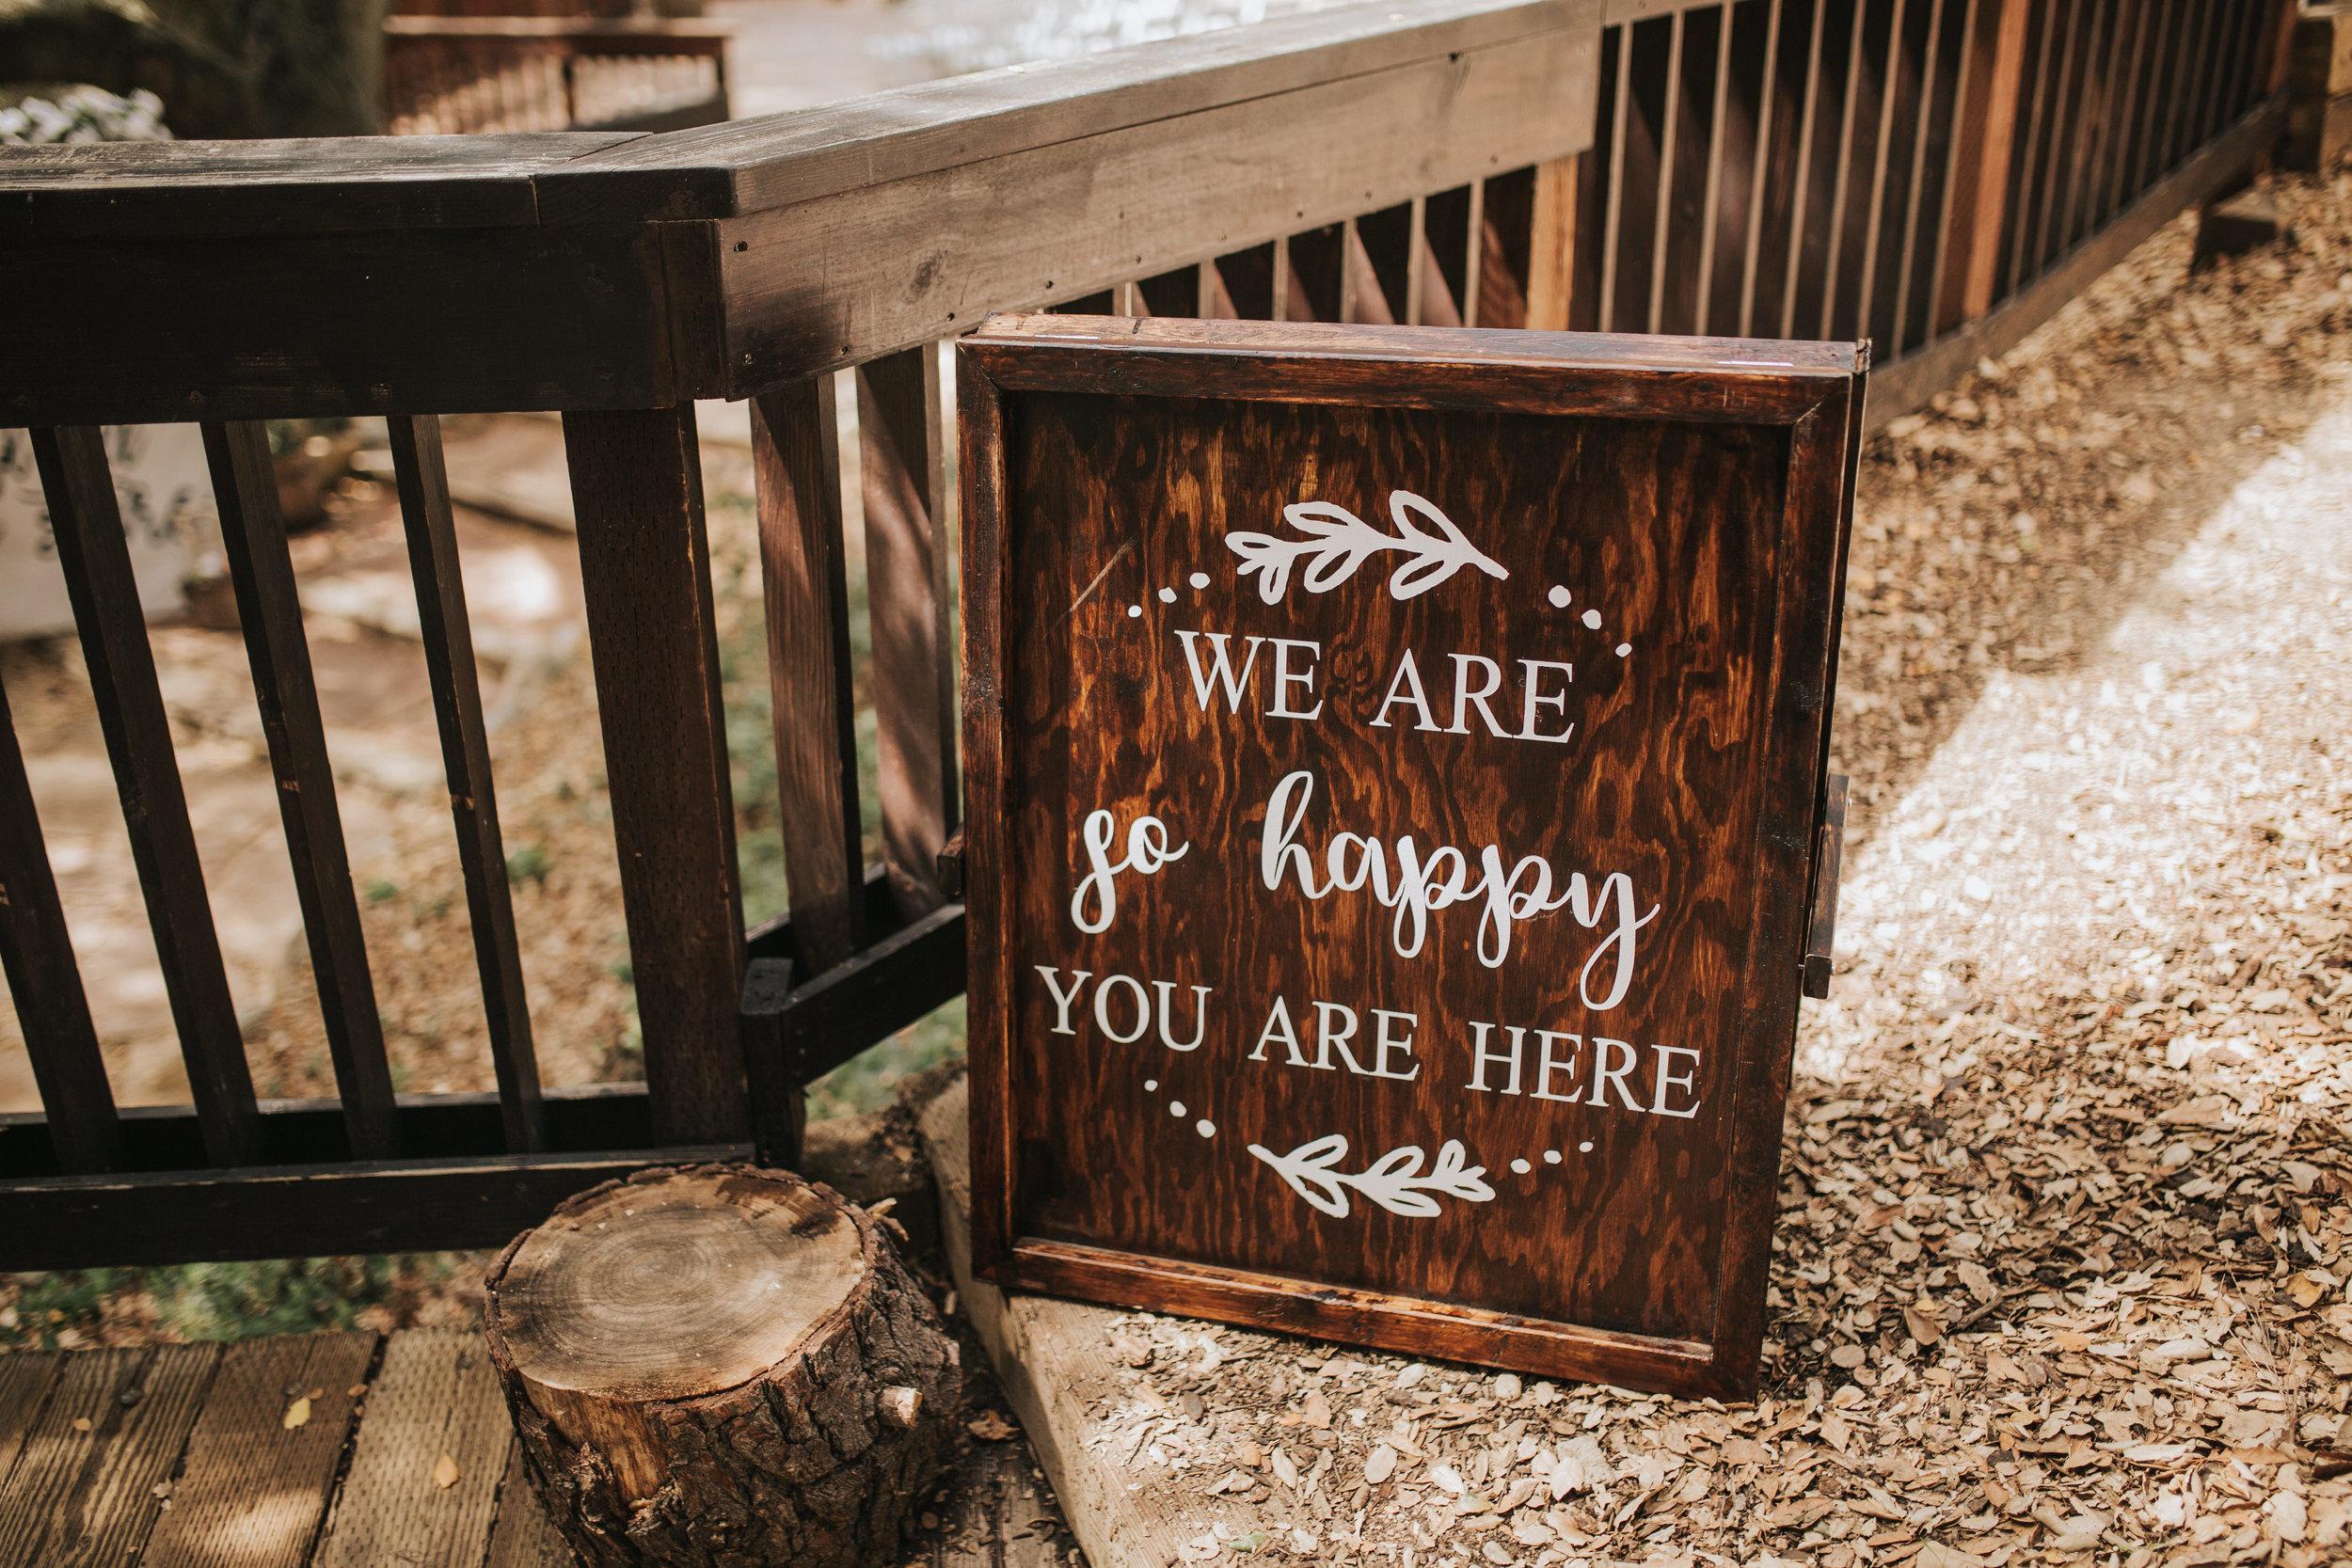 The 1909, The 1909 Wedding, Topanga Canyon Wedding, wedding welcome sign ideas